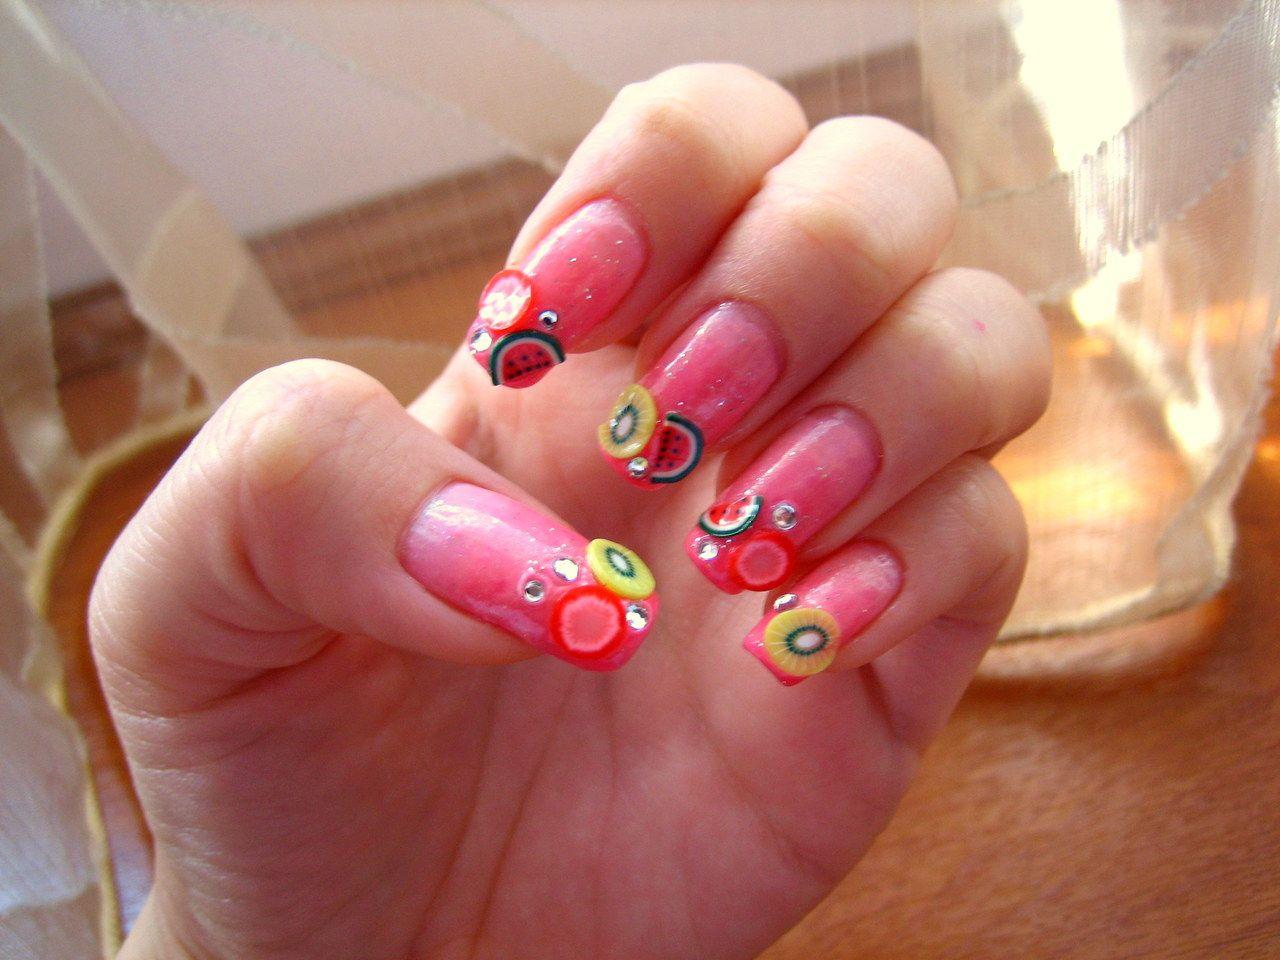 Fruits on Nails | Nail Designs | Pinterest